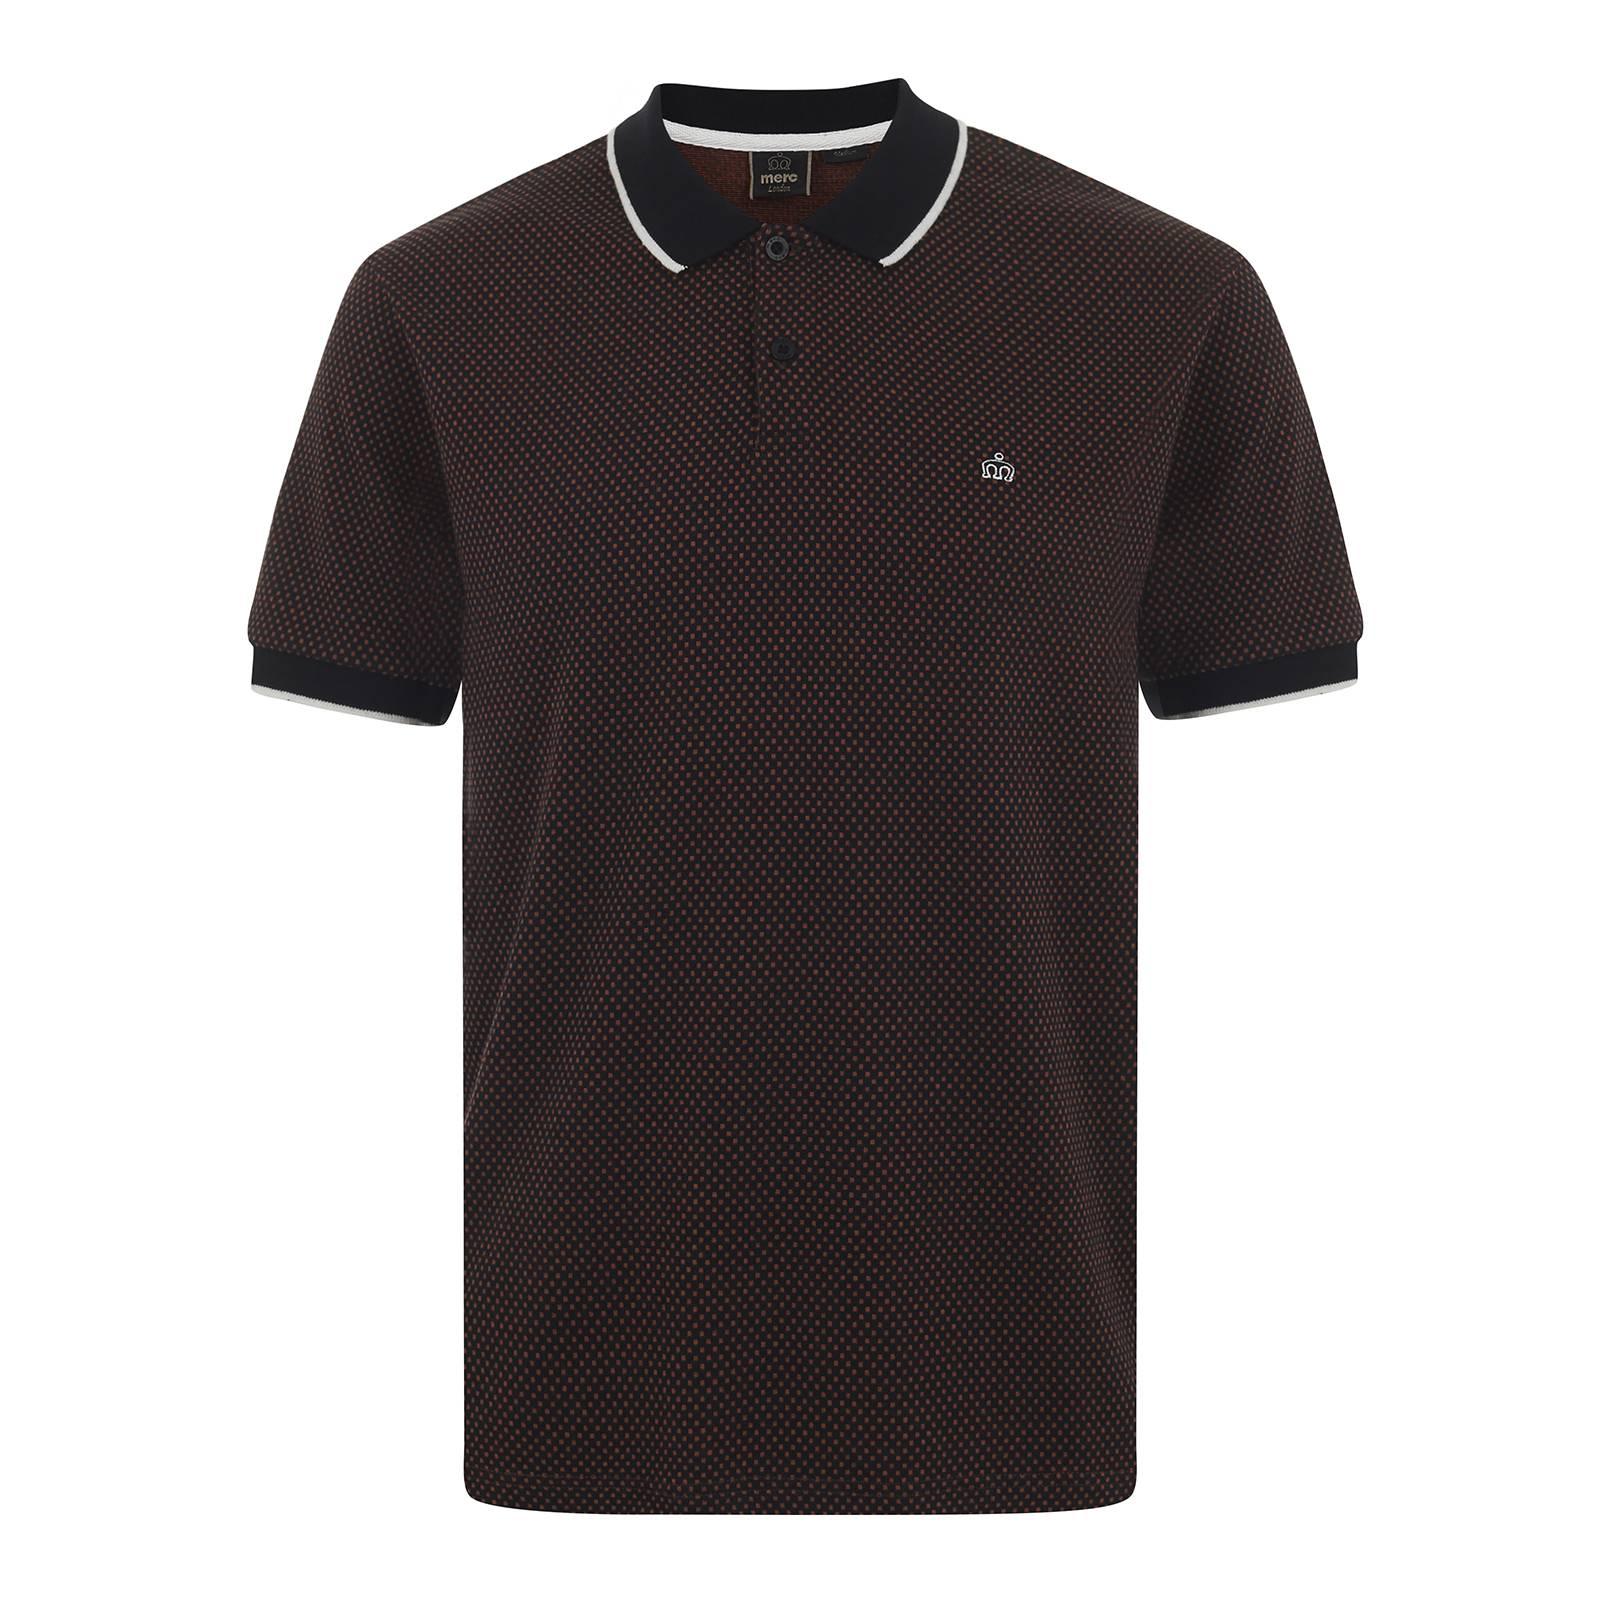 Рубашка Поло HuxleyПоло<br><br><br>Артикул: 1915204<br>Материал: 65% вискоза, 30% полиэстер, 5% эластан<br>Цвет: кирпичный<br>Пол: Мужской